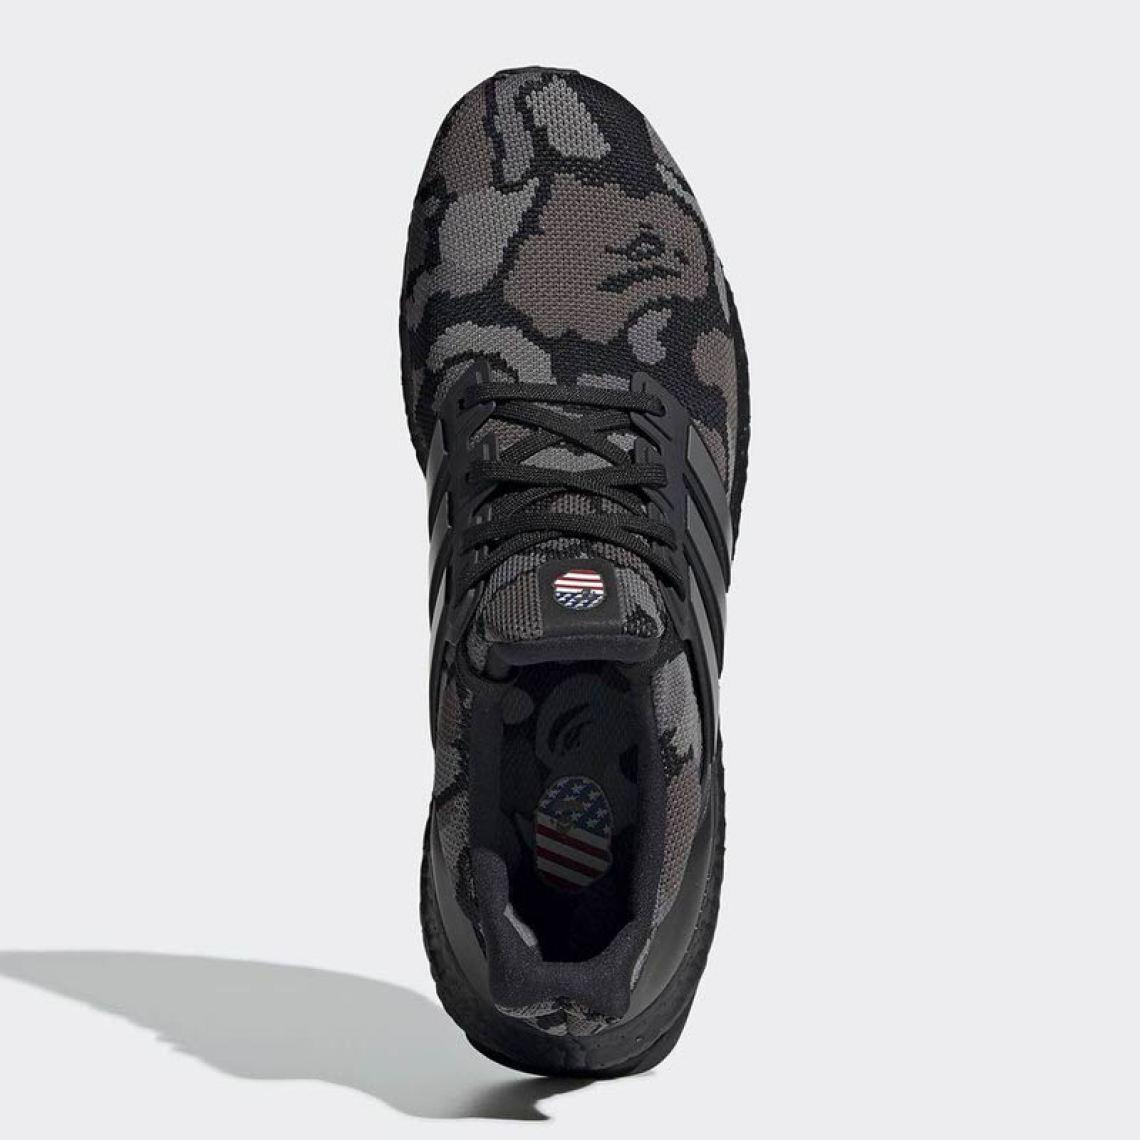 BAPE x adidas Ultra Boost